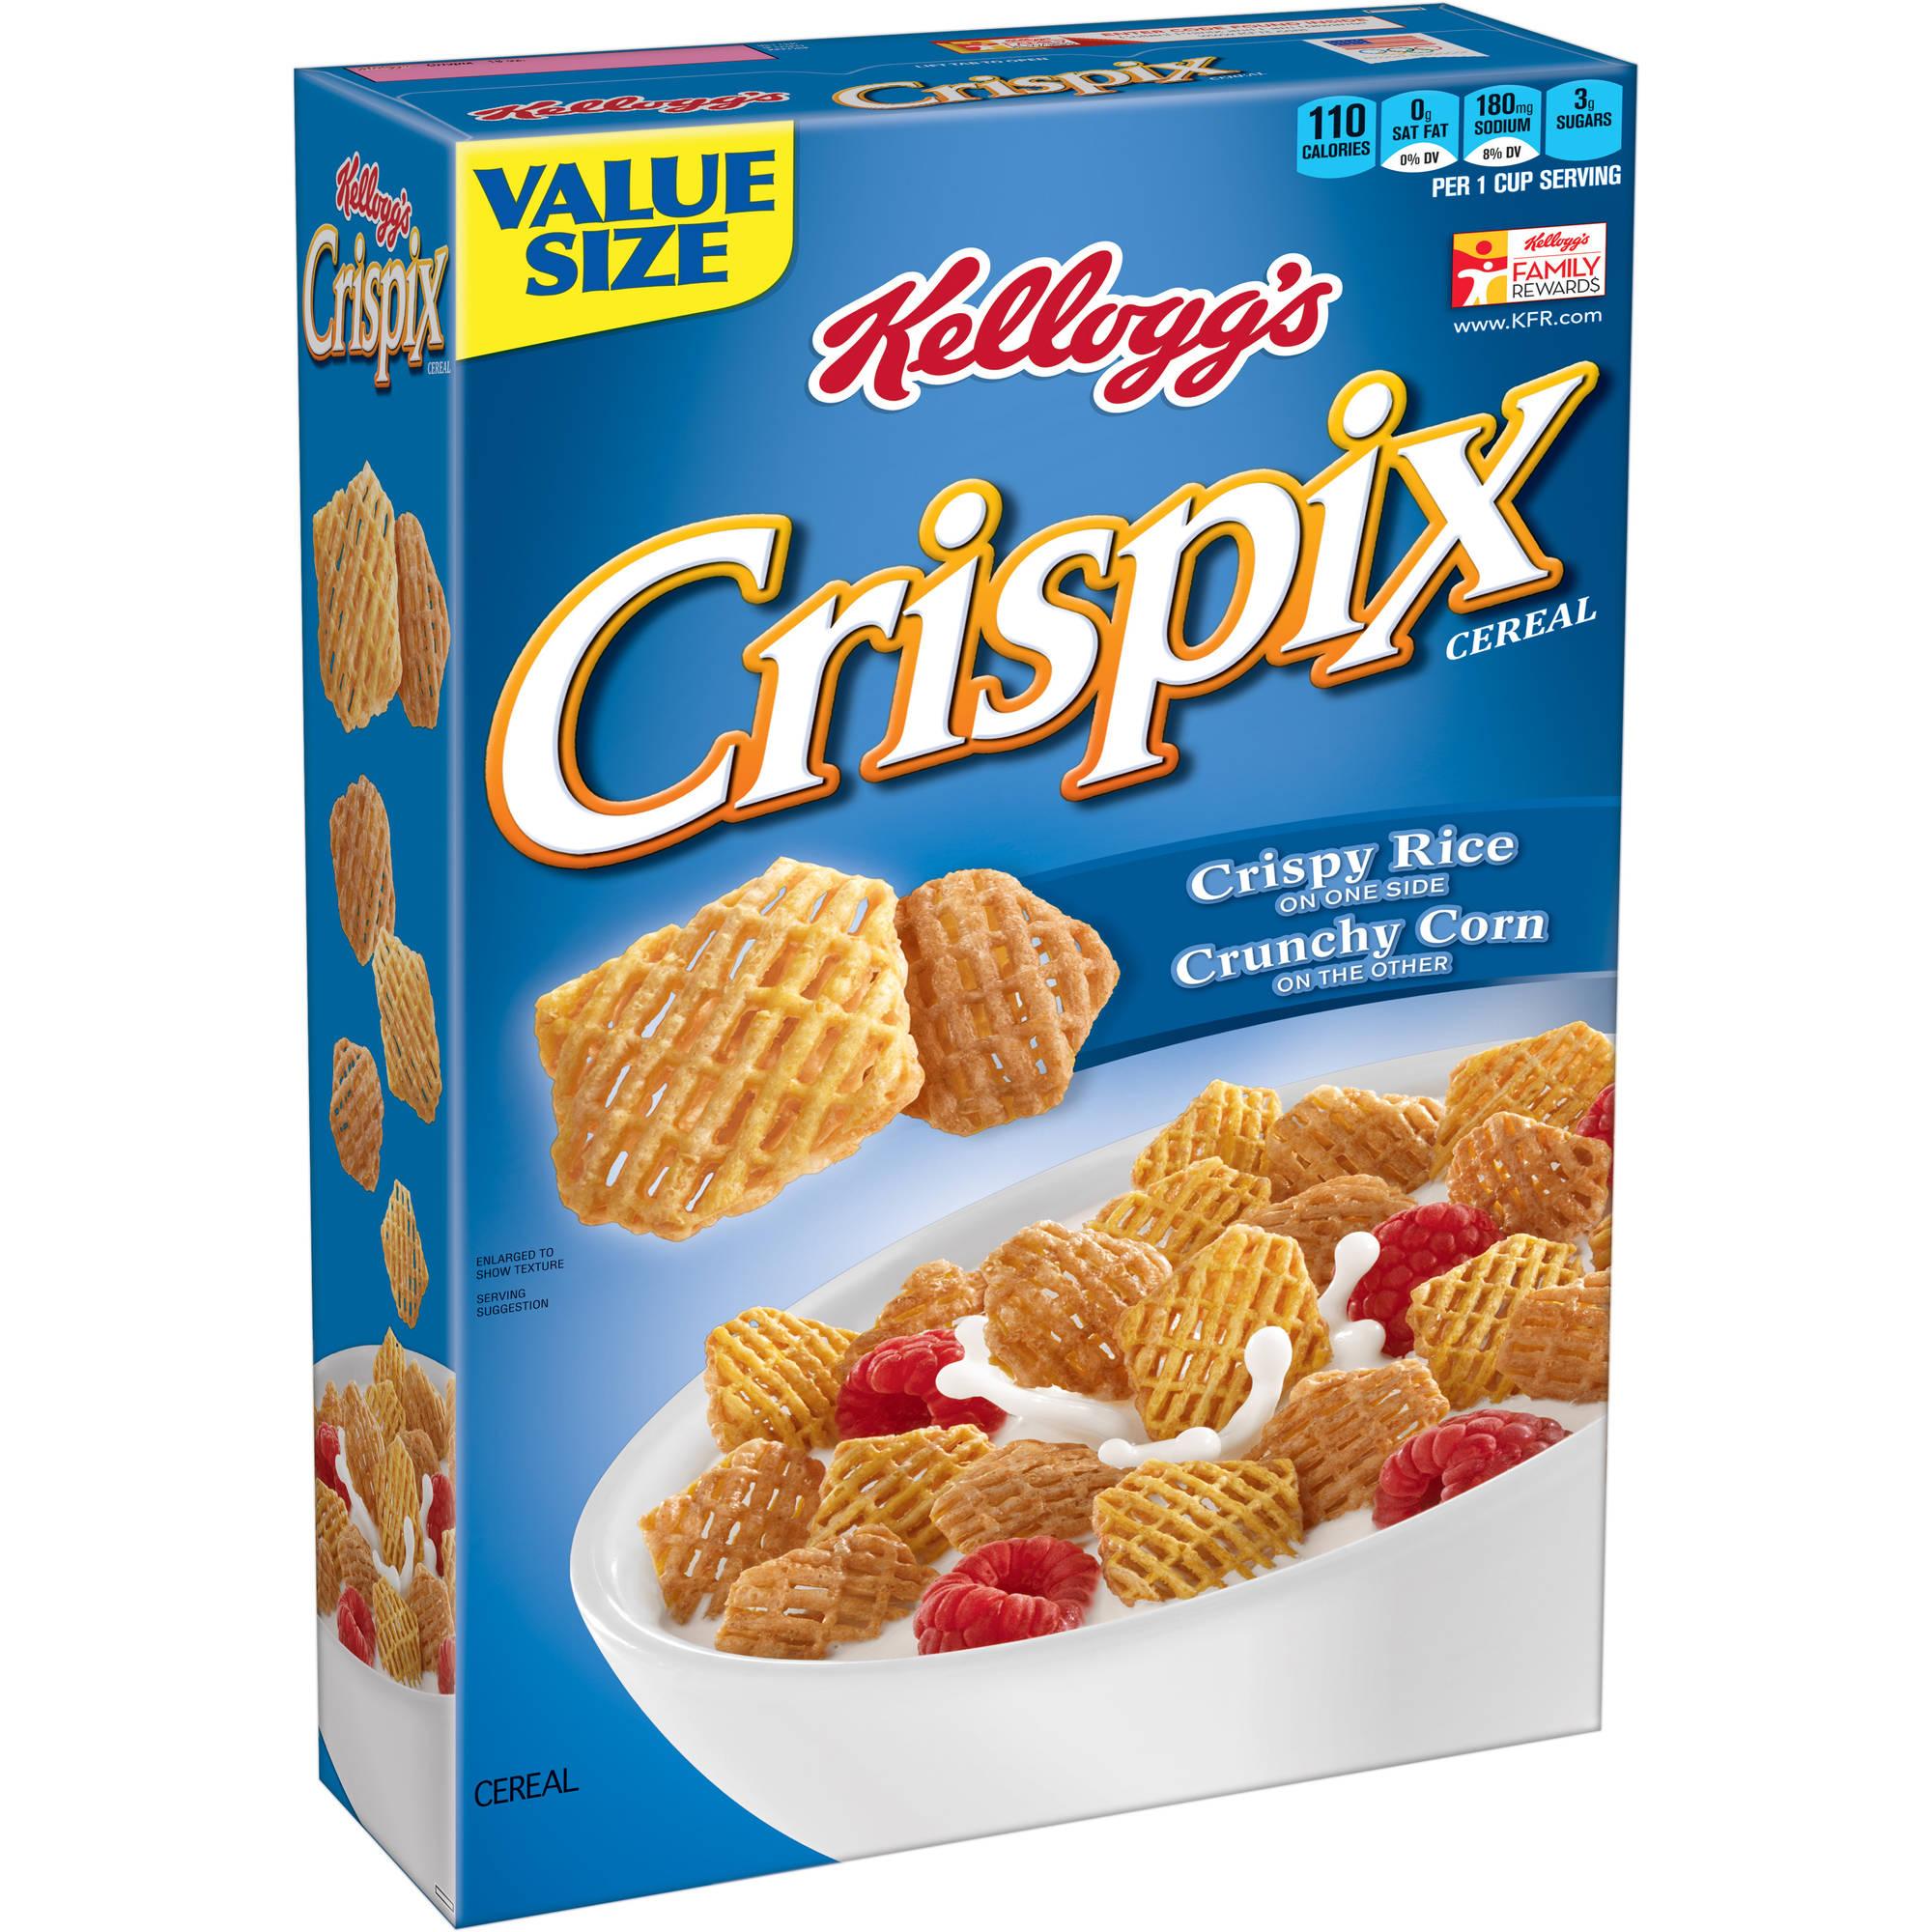 Kellogg's Crispix Original Cereal Family Size, 18 oz